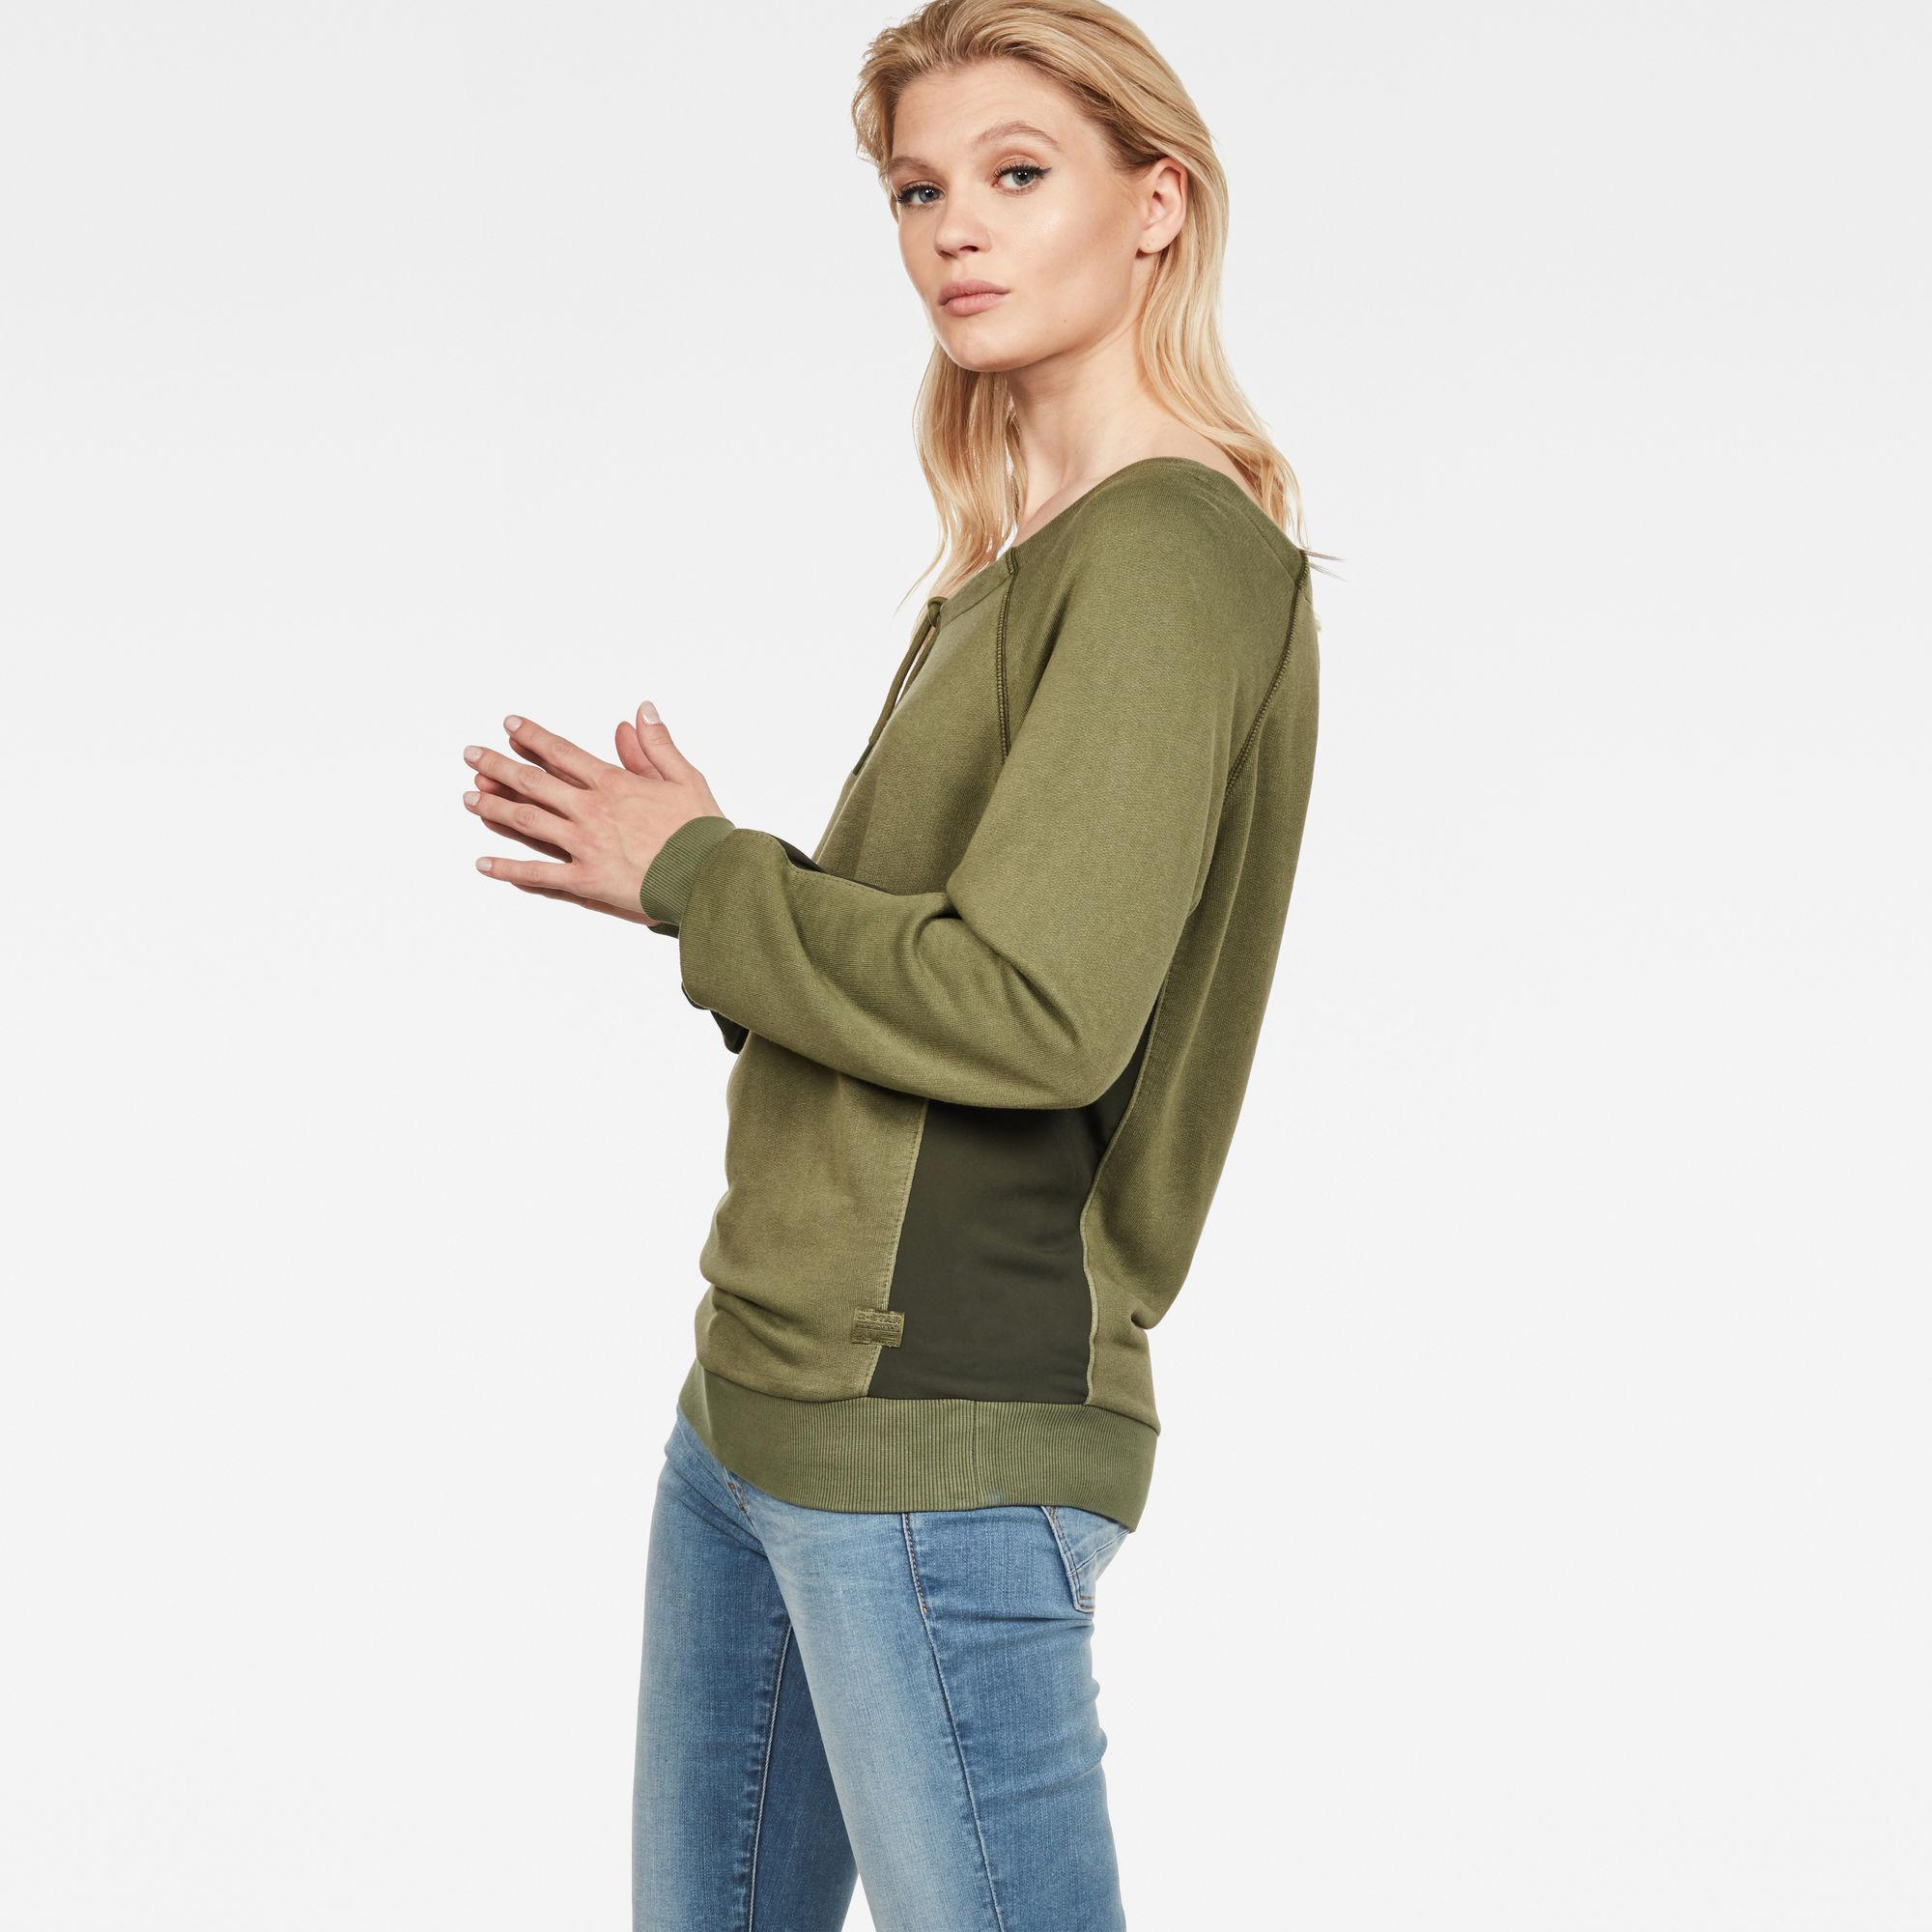 G-Star RAW Ore Sweater